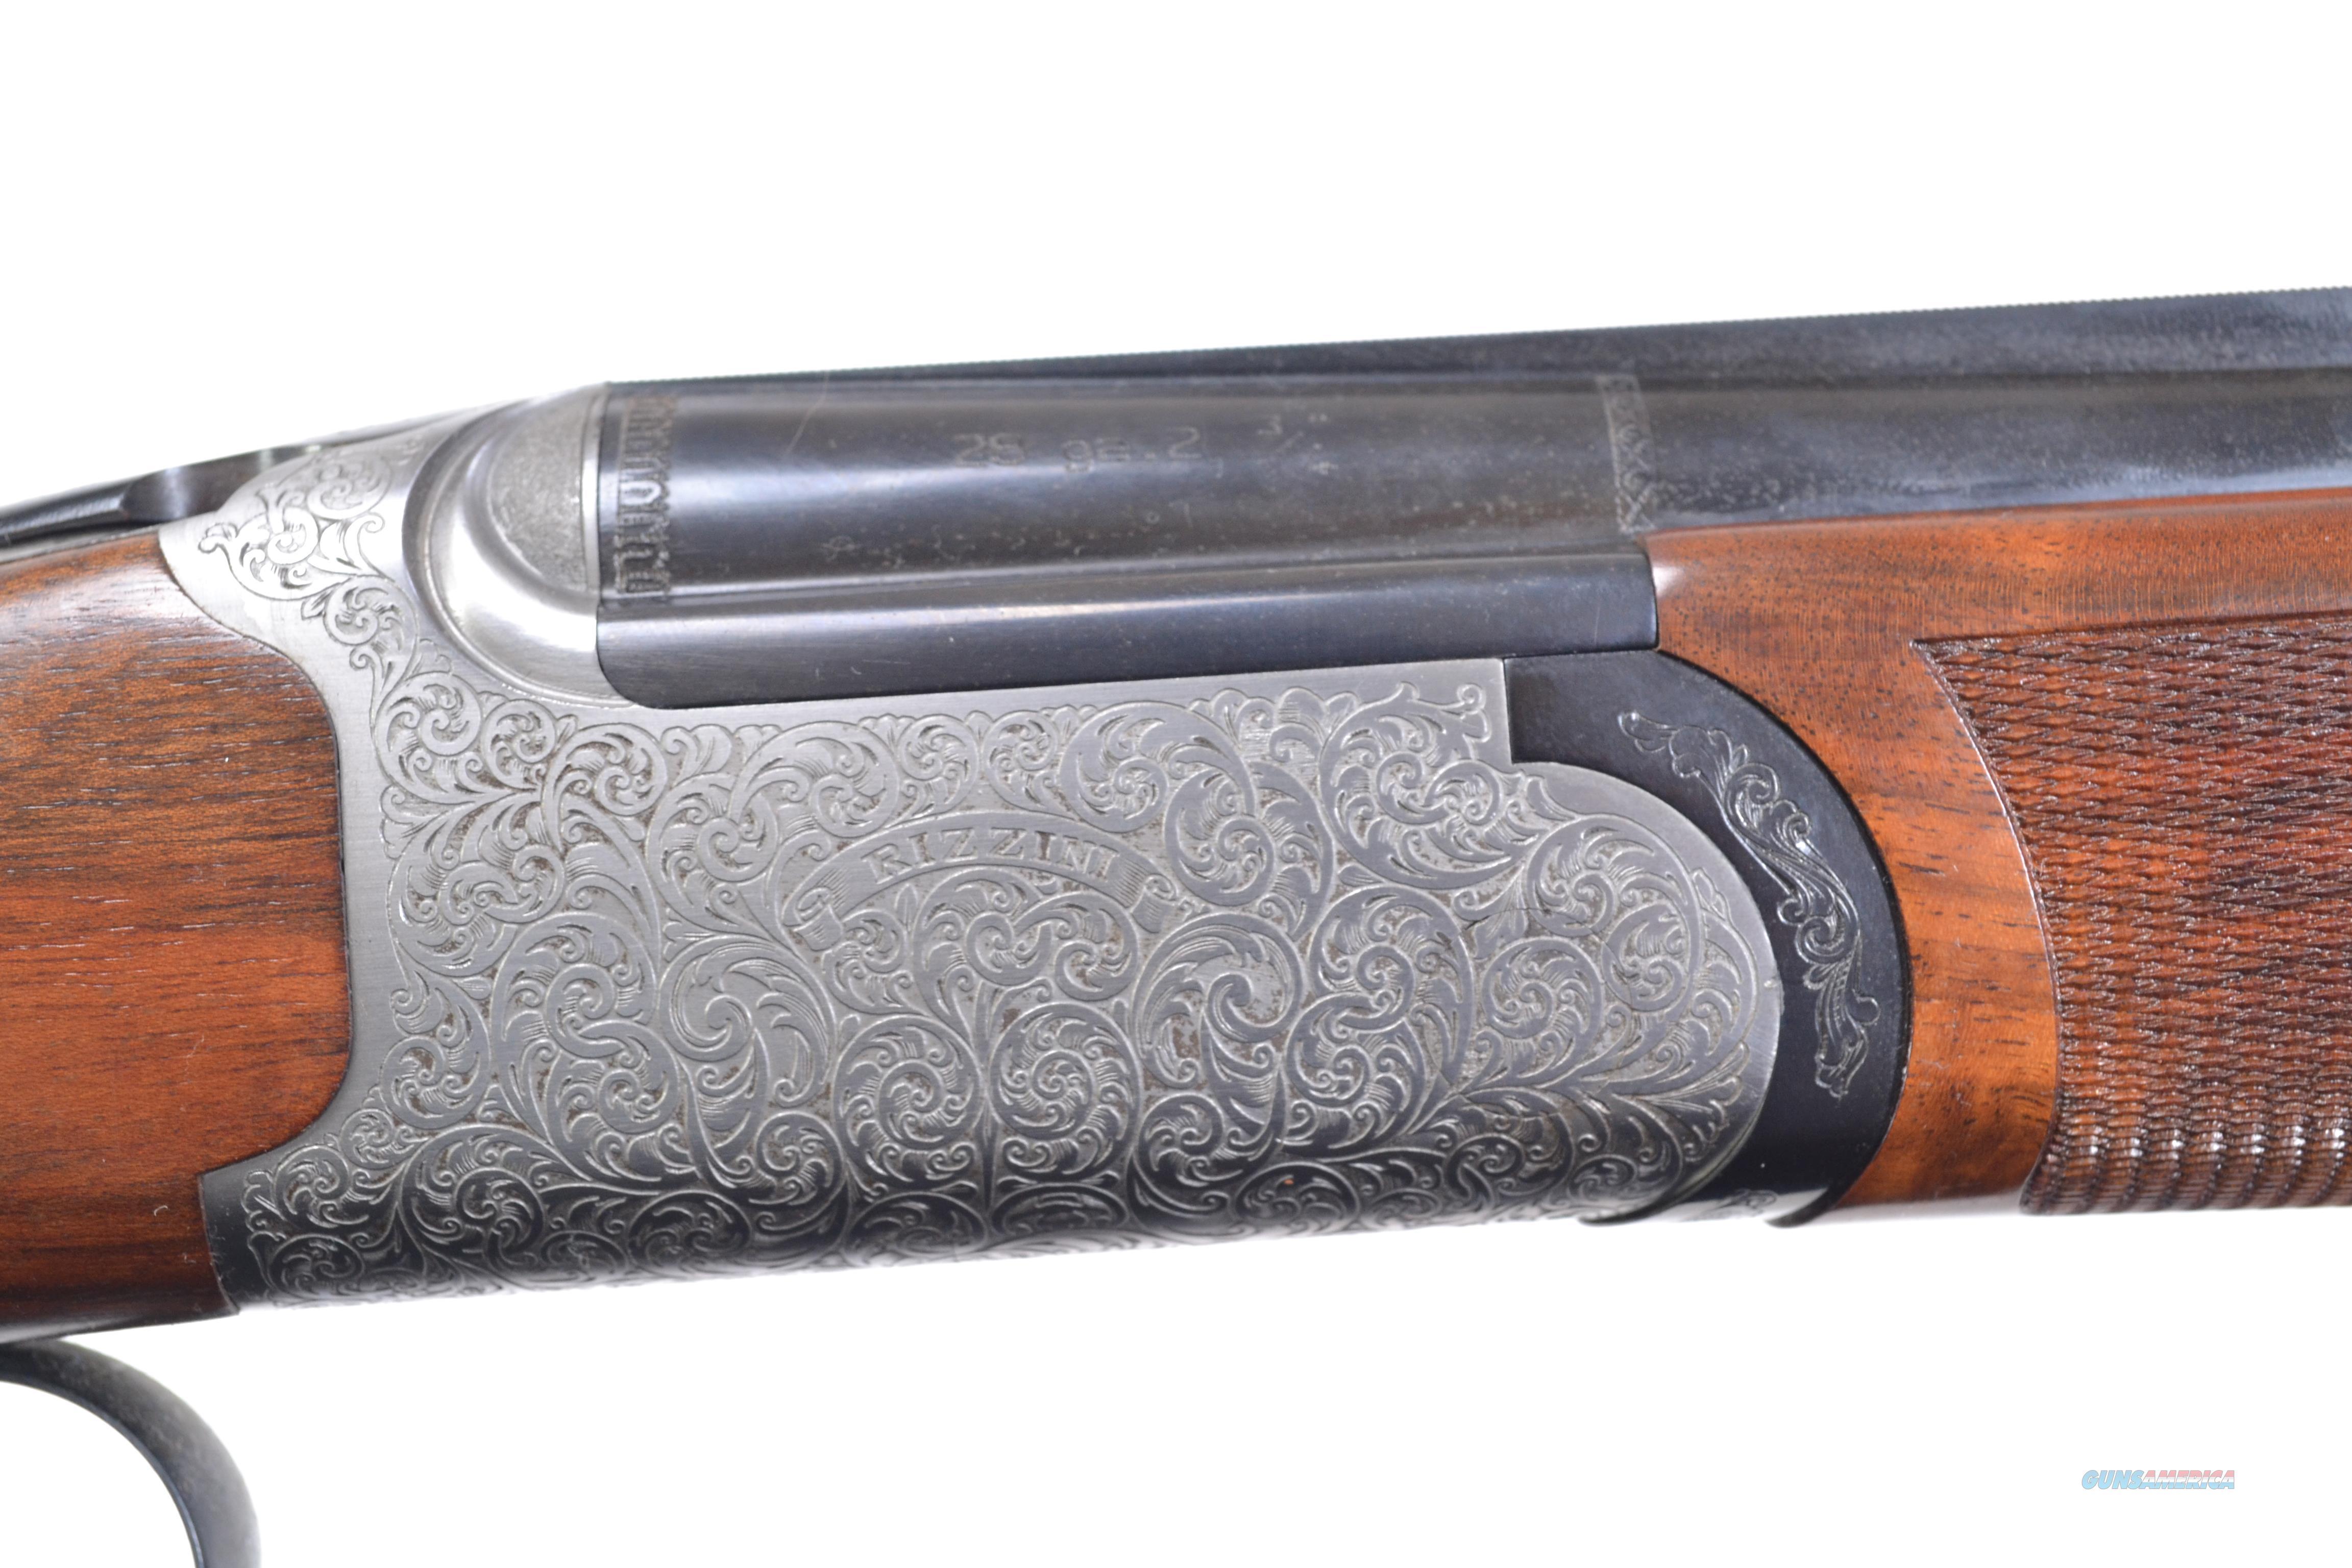 "B. Rizzini - Round Body EM Small Action, 28ga, 29"" barrels  Guns > Shotguns > Rizzini Shotguns"